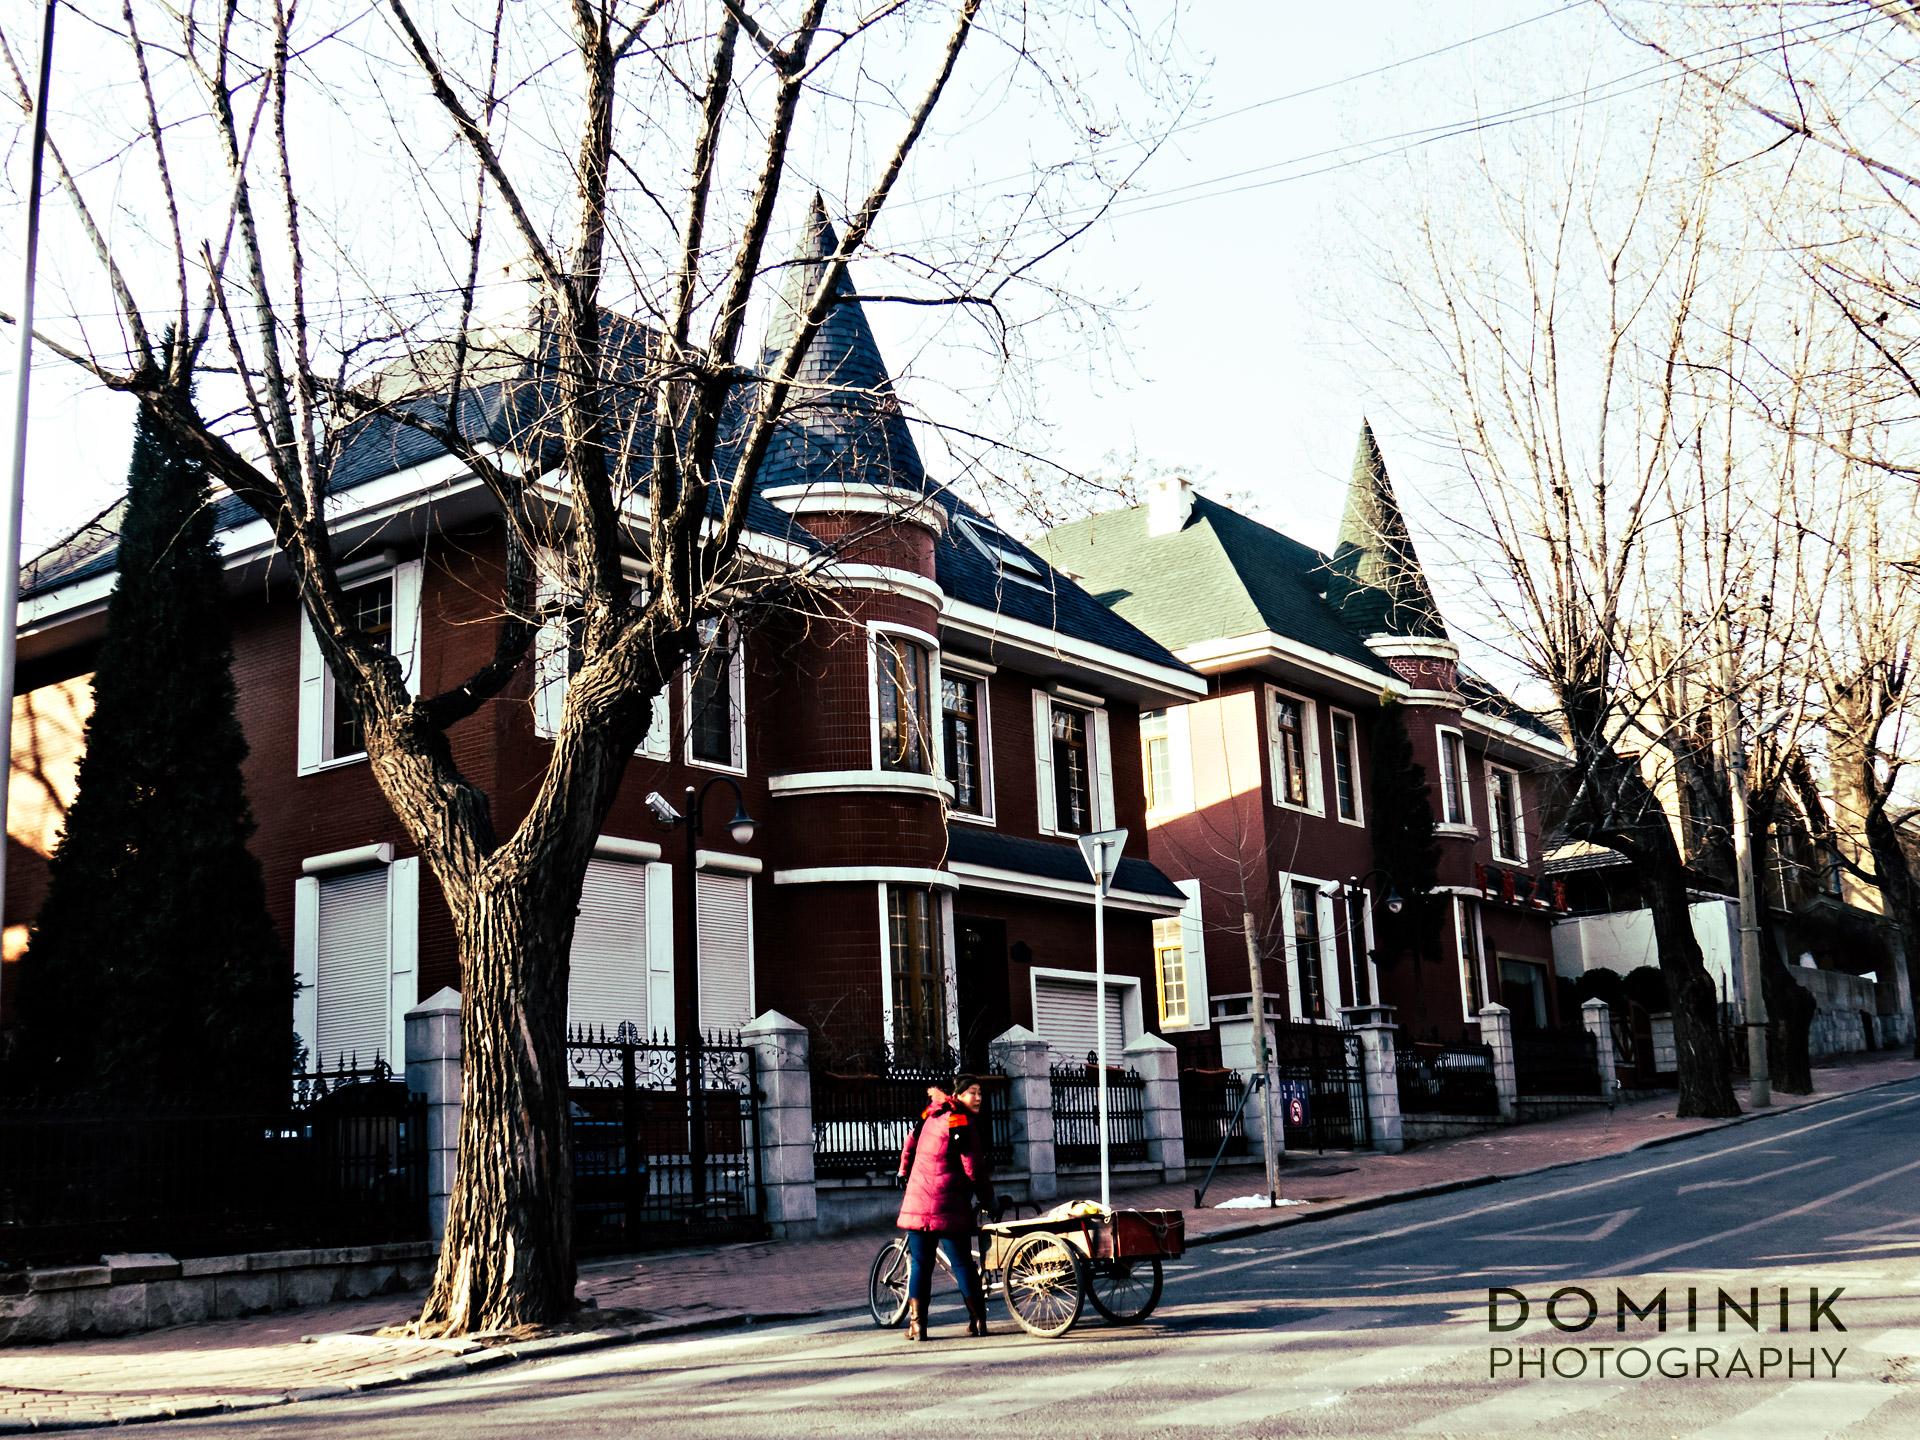 Dalian China photographed by DOMINIK